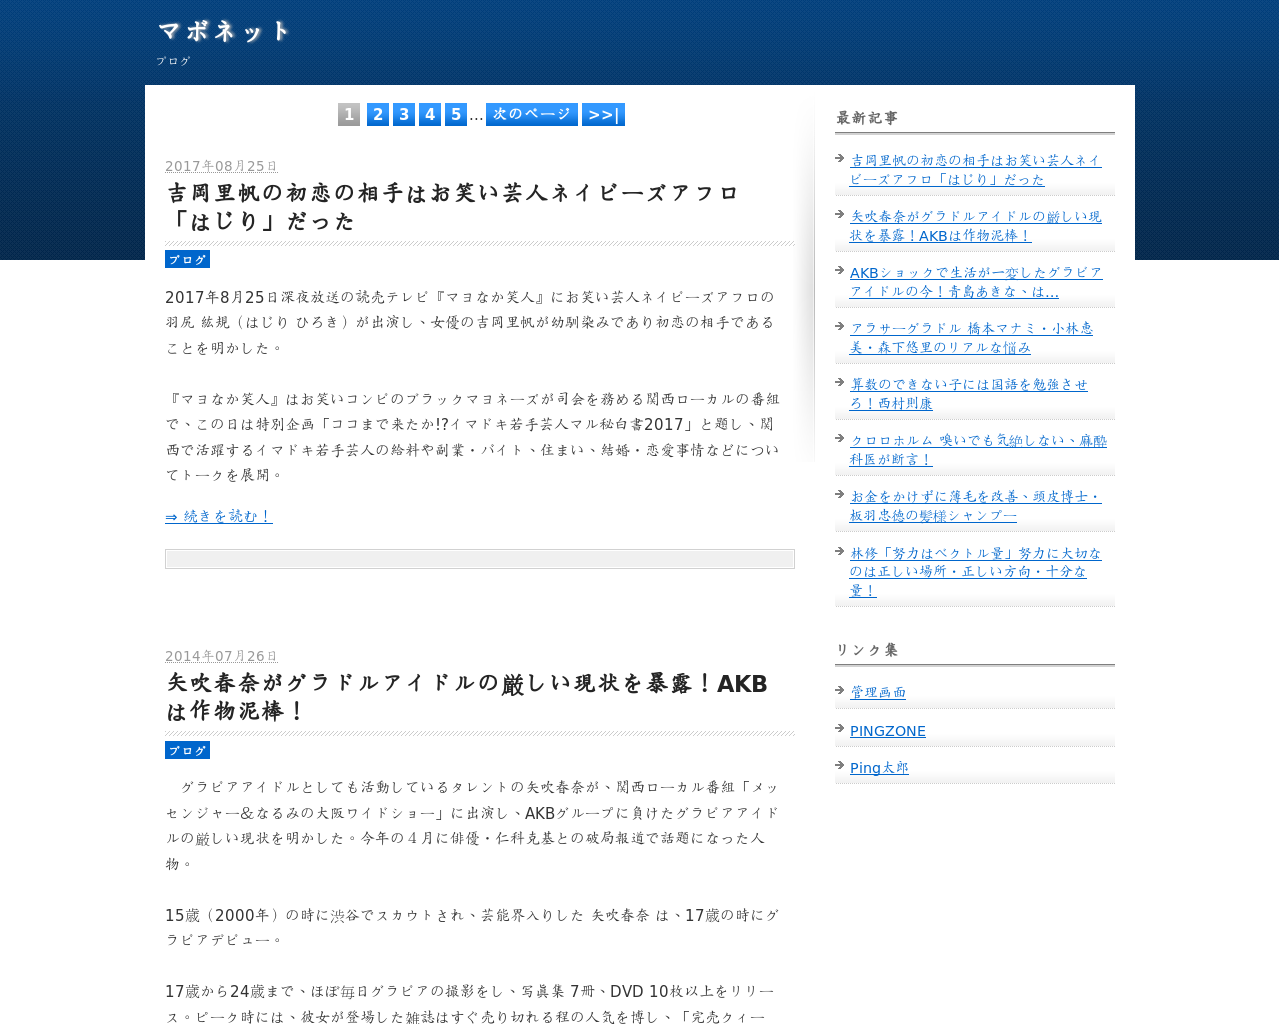 mabo.livedoor.biz(2018/04/16 10:50:40)